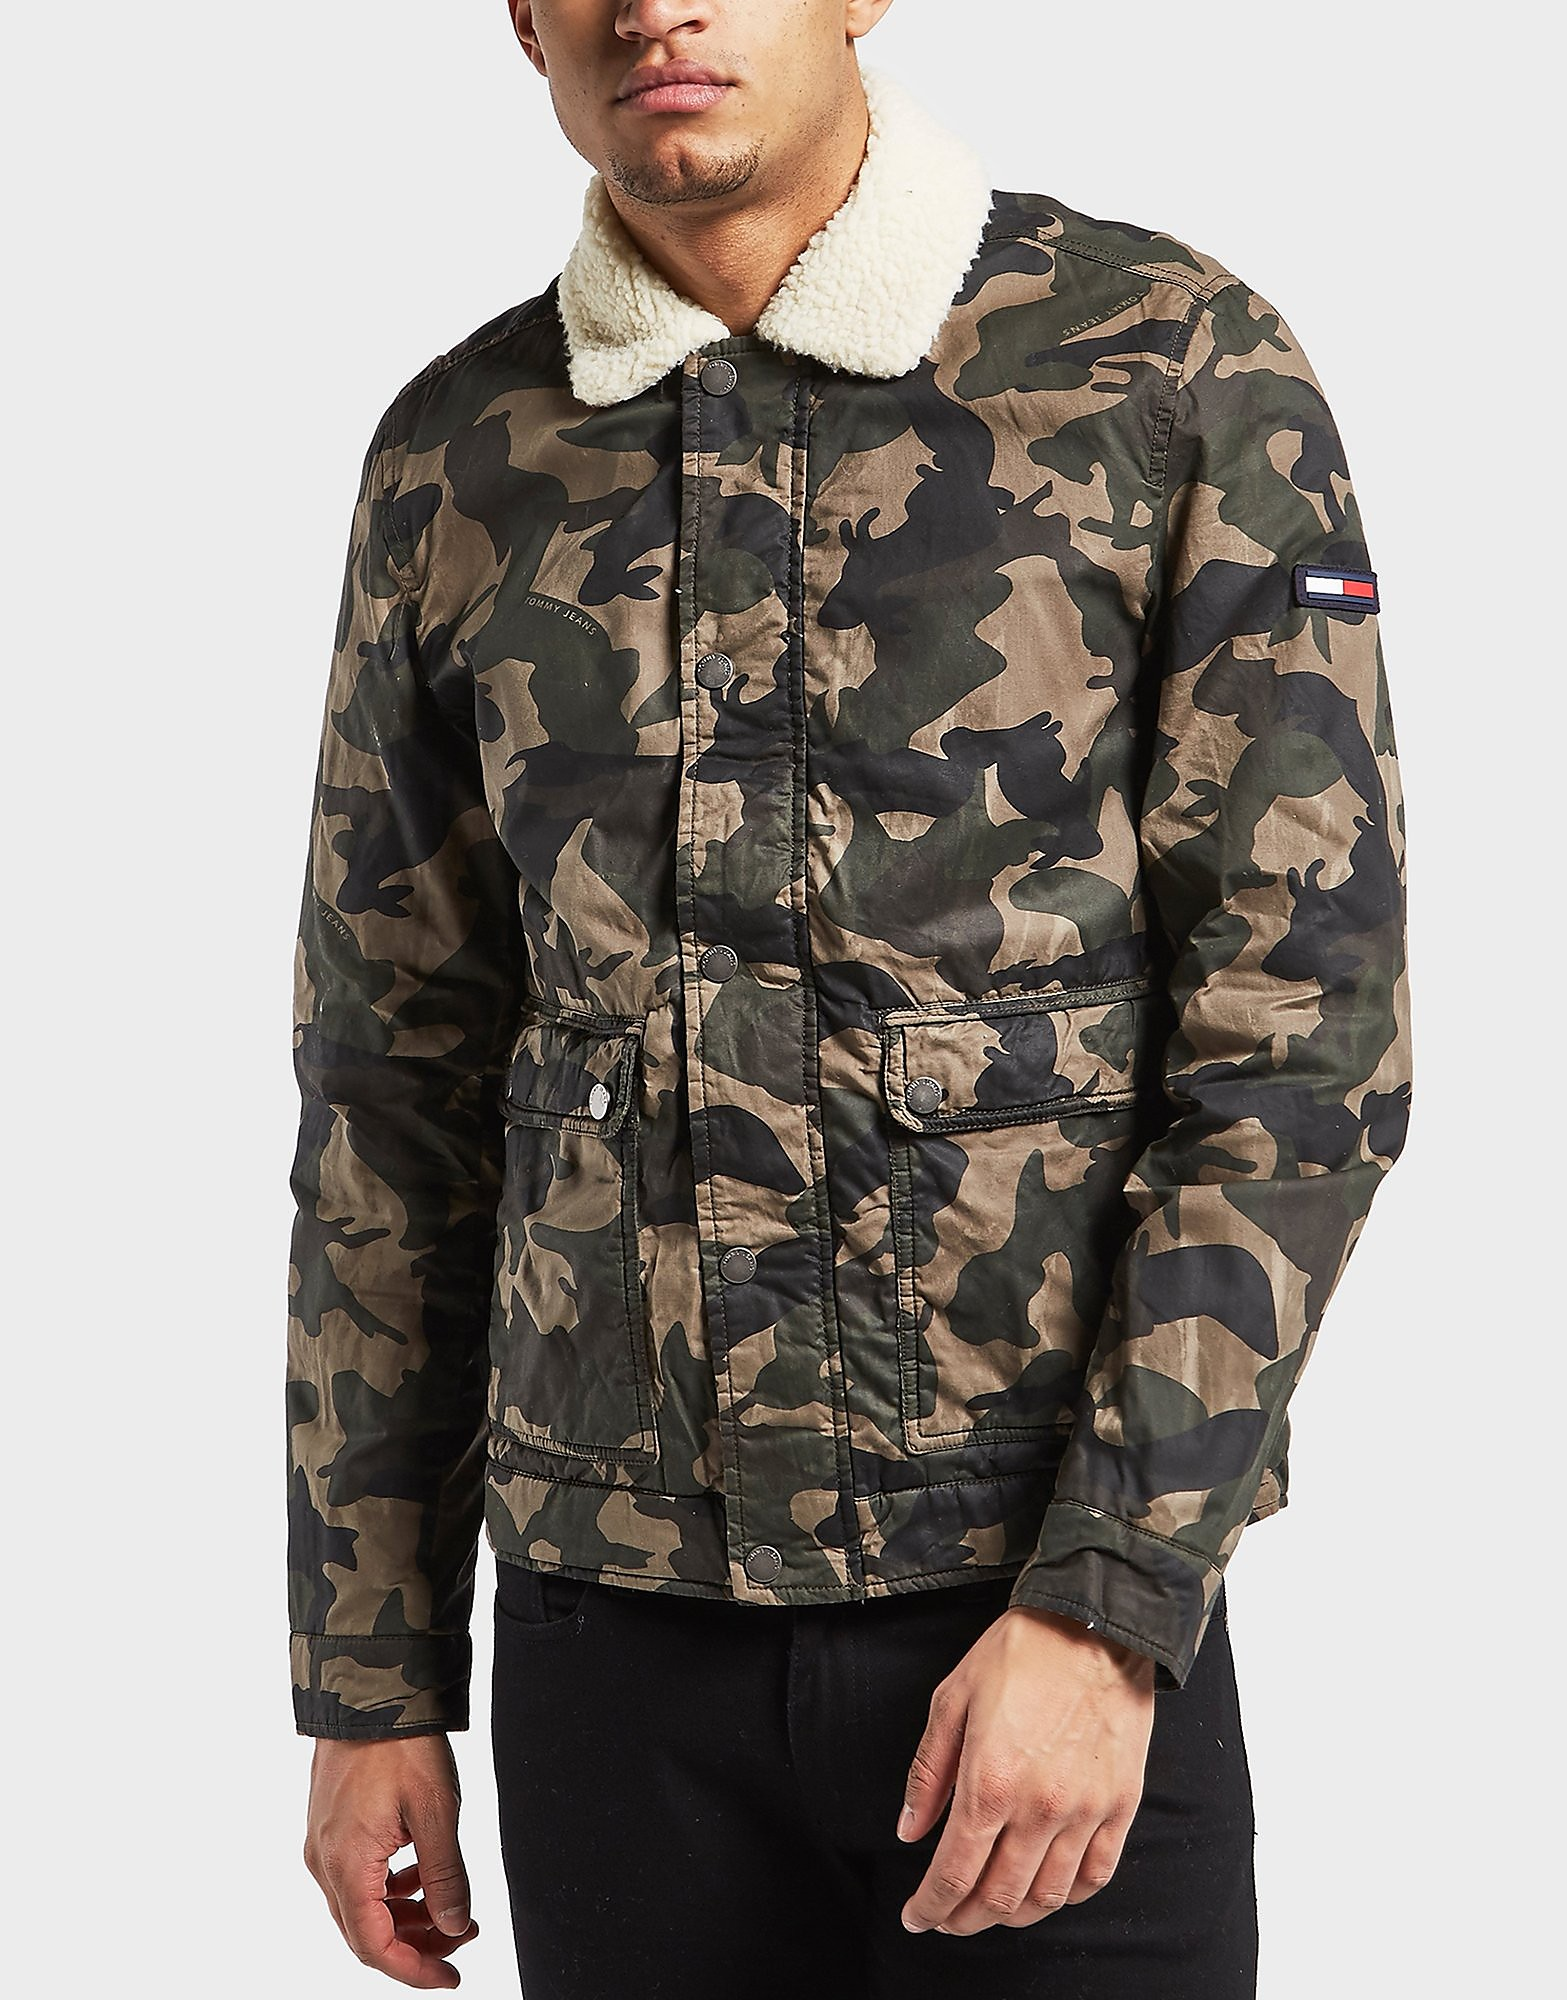 Tommy Hilfiger Camouflage Sherpa Jacket